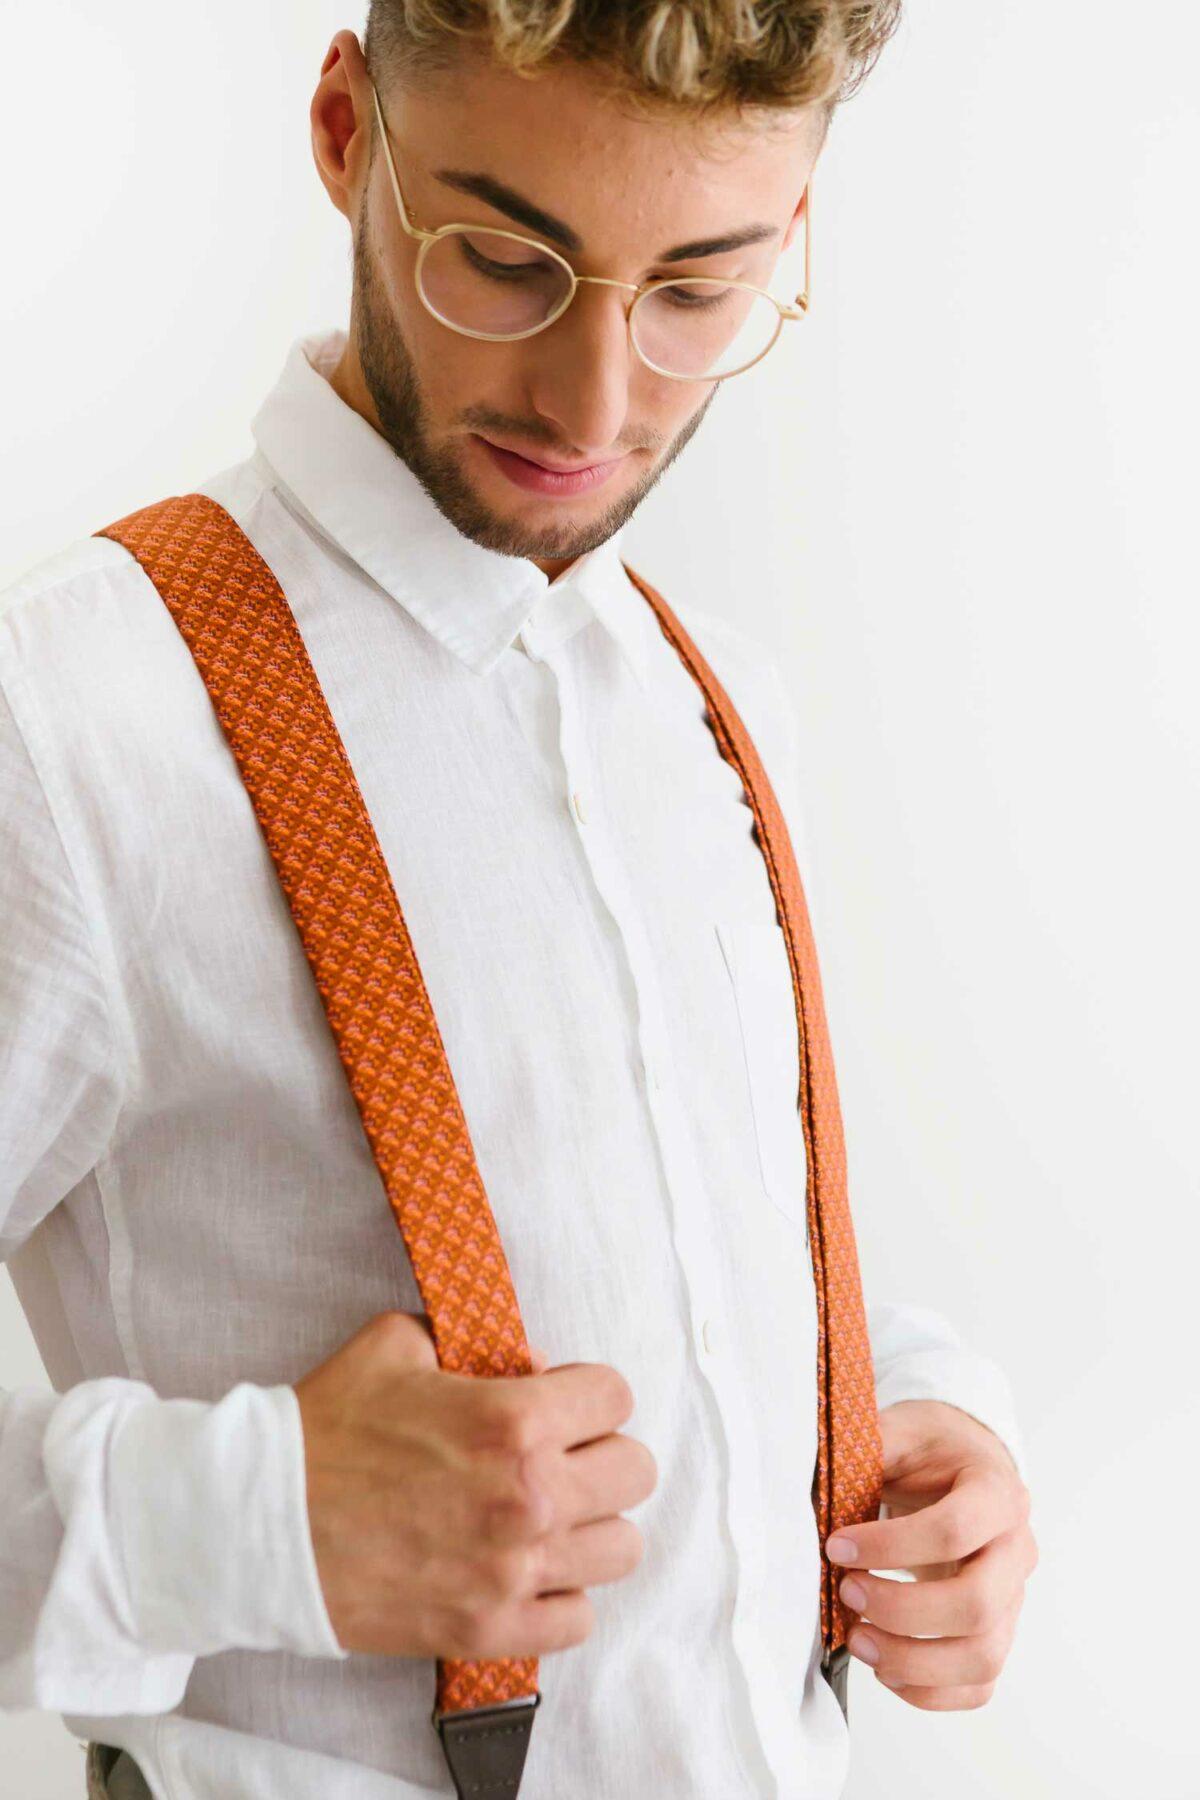 man with rusty orange suspenders